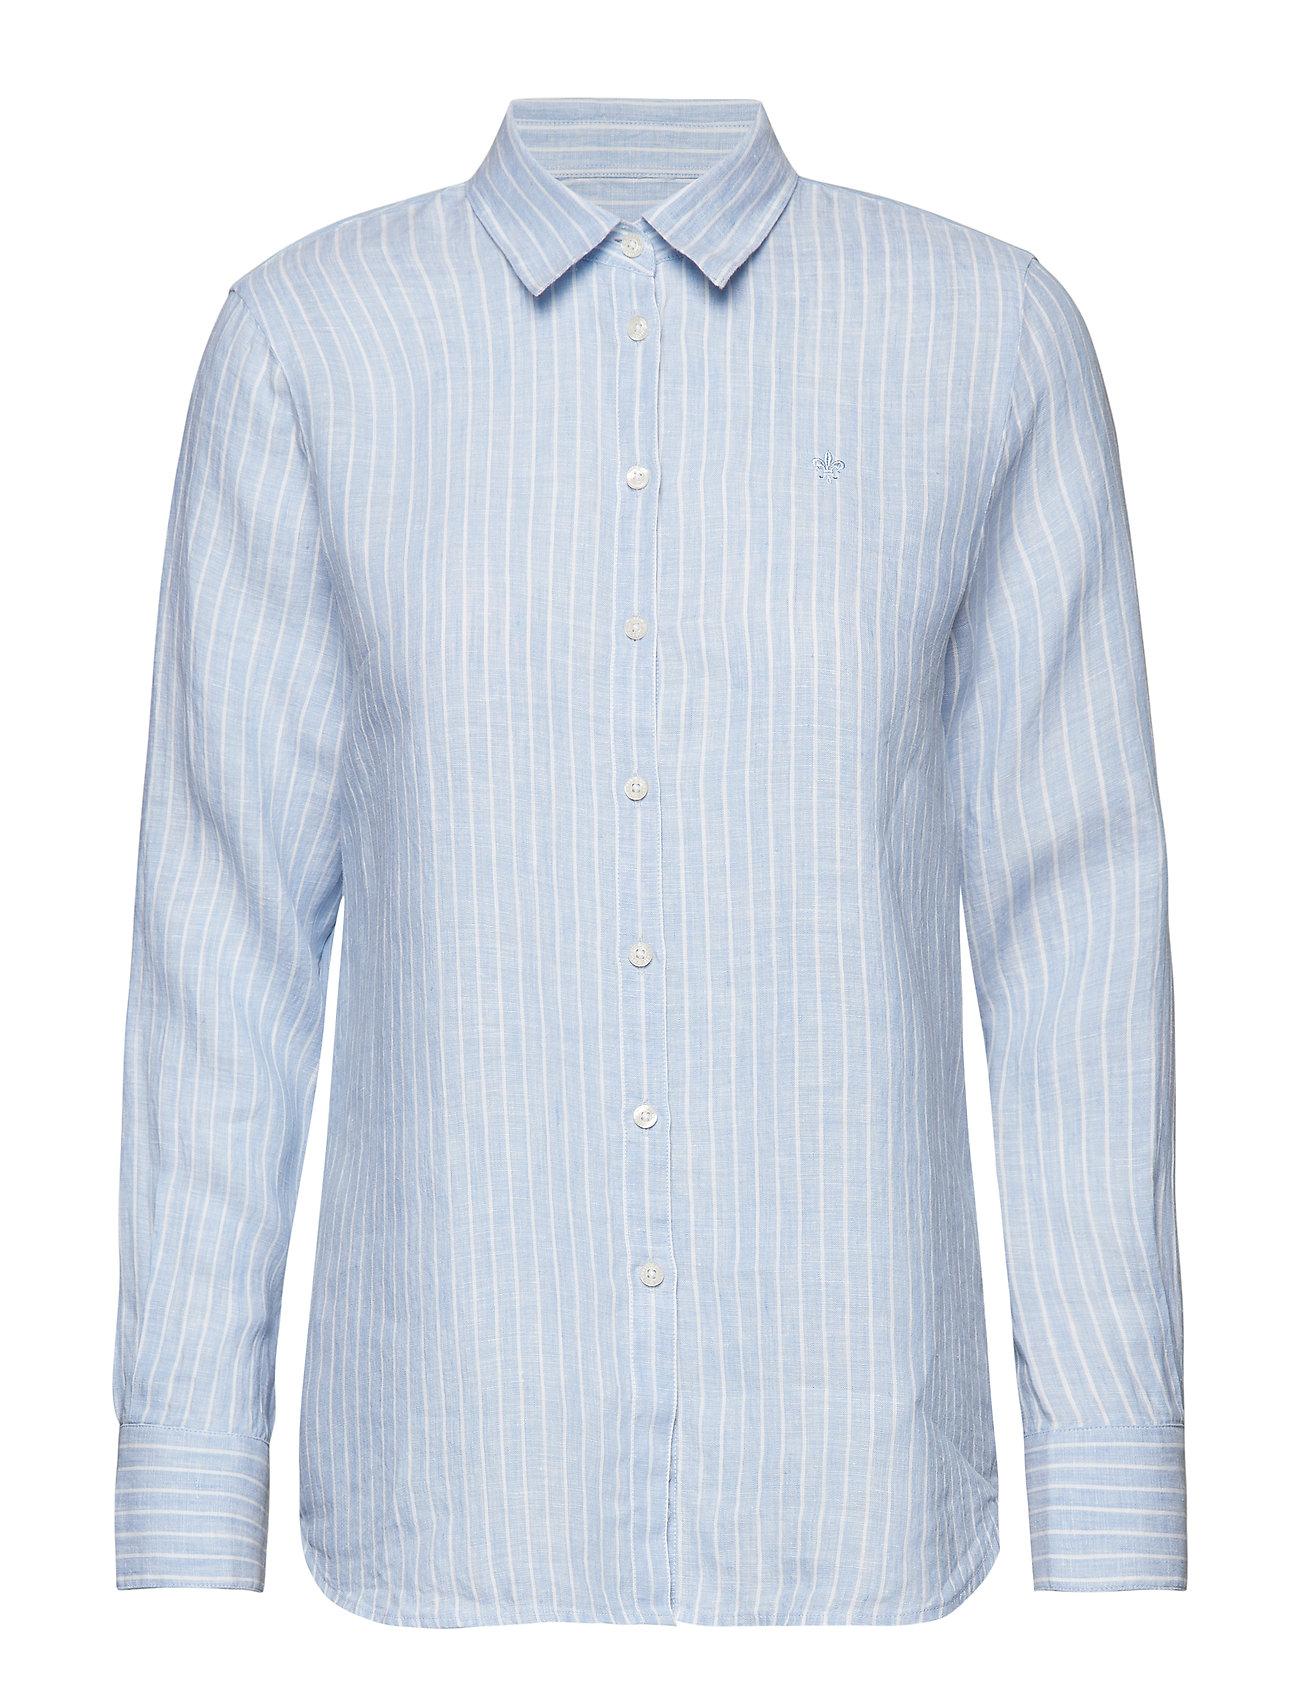 BlueMorris Stripe Shirtlight Linen Kirsten Lady 0k8wOXnP